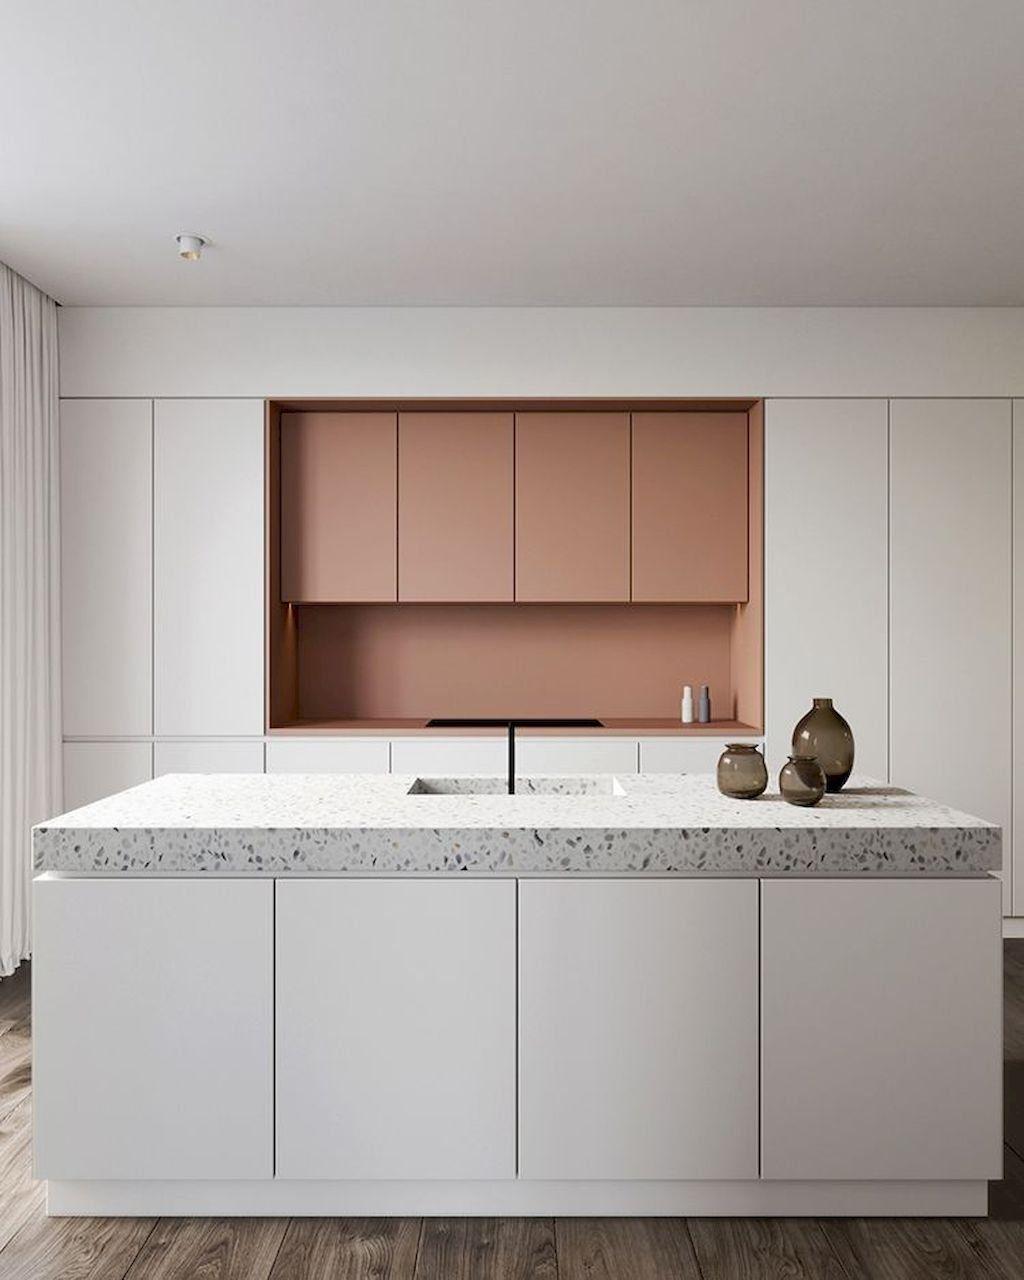 63 Great Ideas For Kitchen Islands Dizajn Interera Kuhni Eklektichnaya Kuhnya Pereplanirovka Kuhni